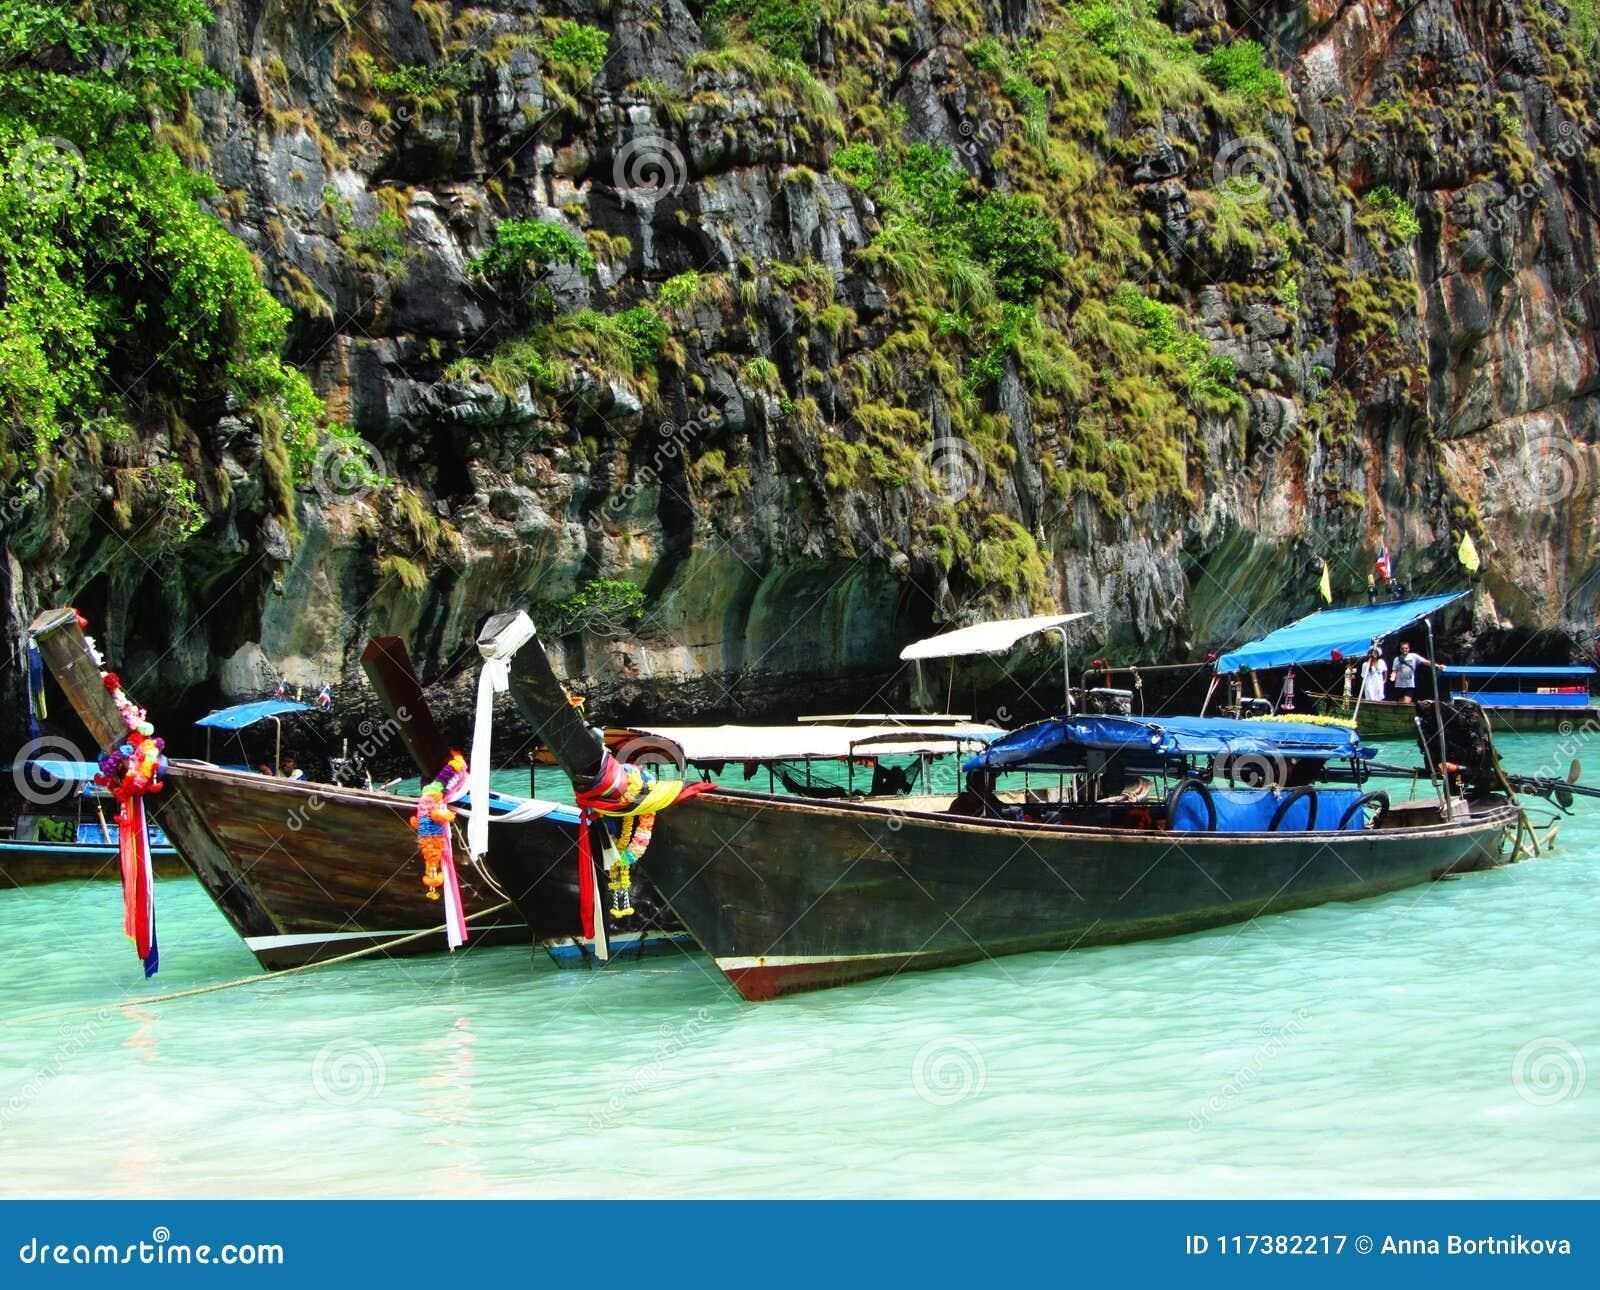 Longtale小船在普吉岛靠岸与在背景的石灰石岩石在泰国 普吉岛海岛是一最普遍的旅游destinat